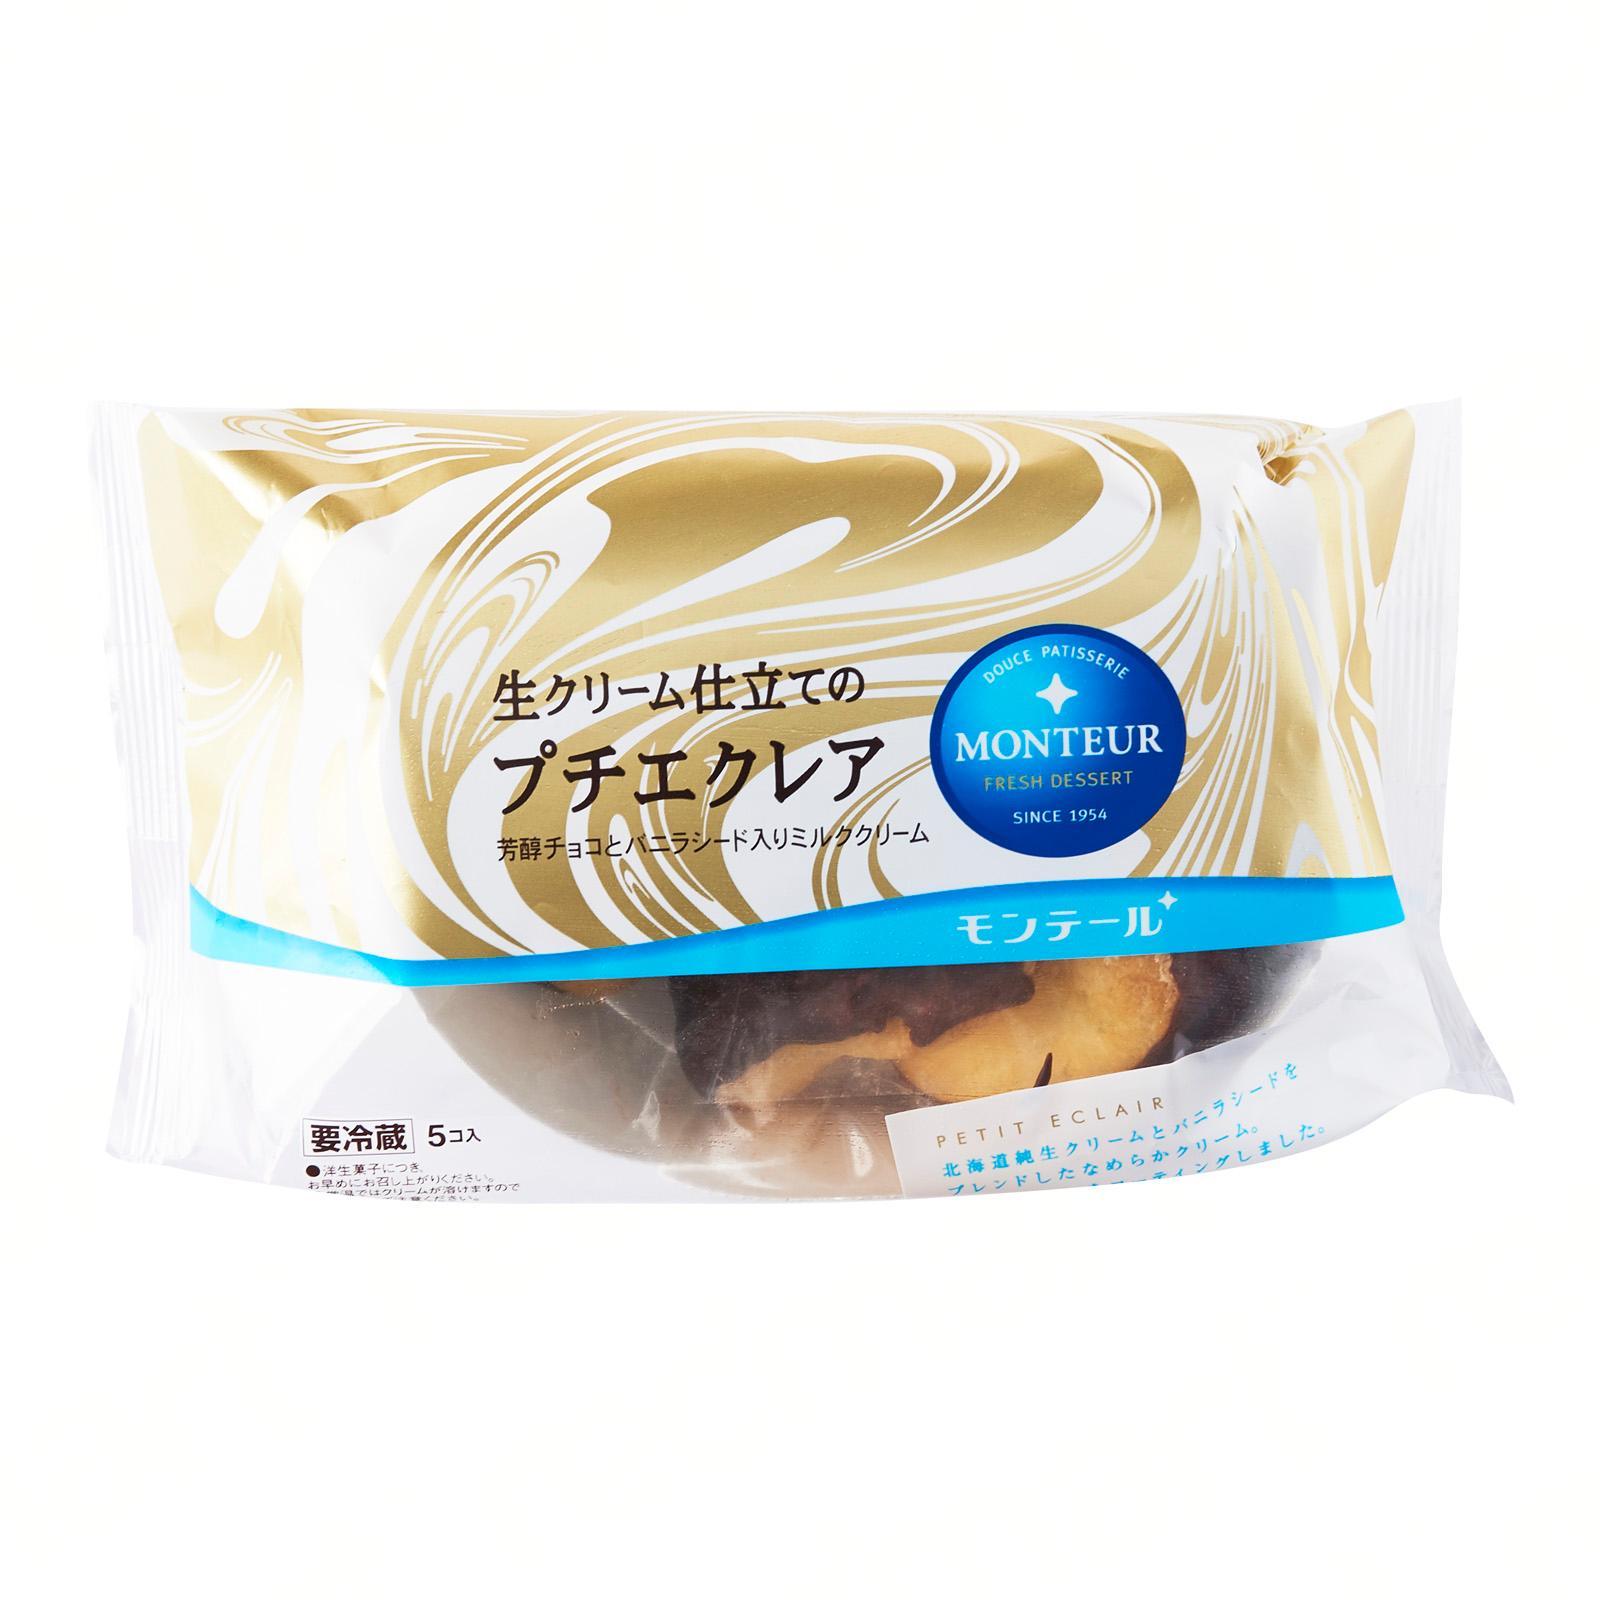 Monteur Eclair: Fresh Cream - Frozen - by J-mart Japanese Food Market